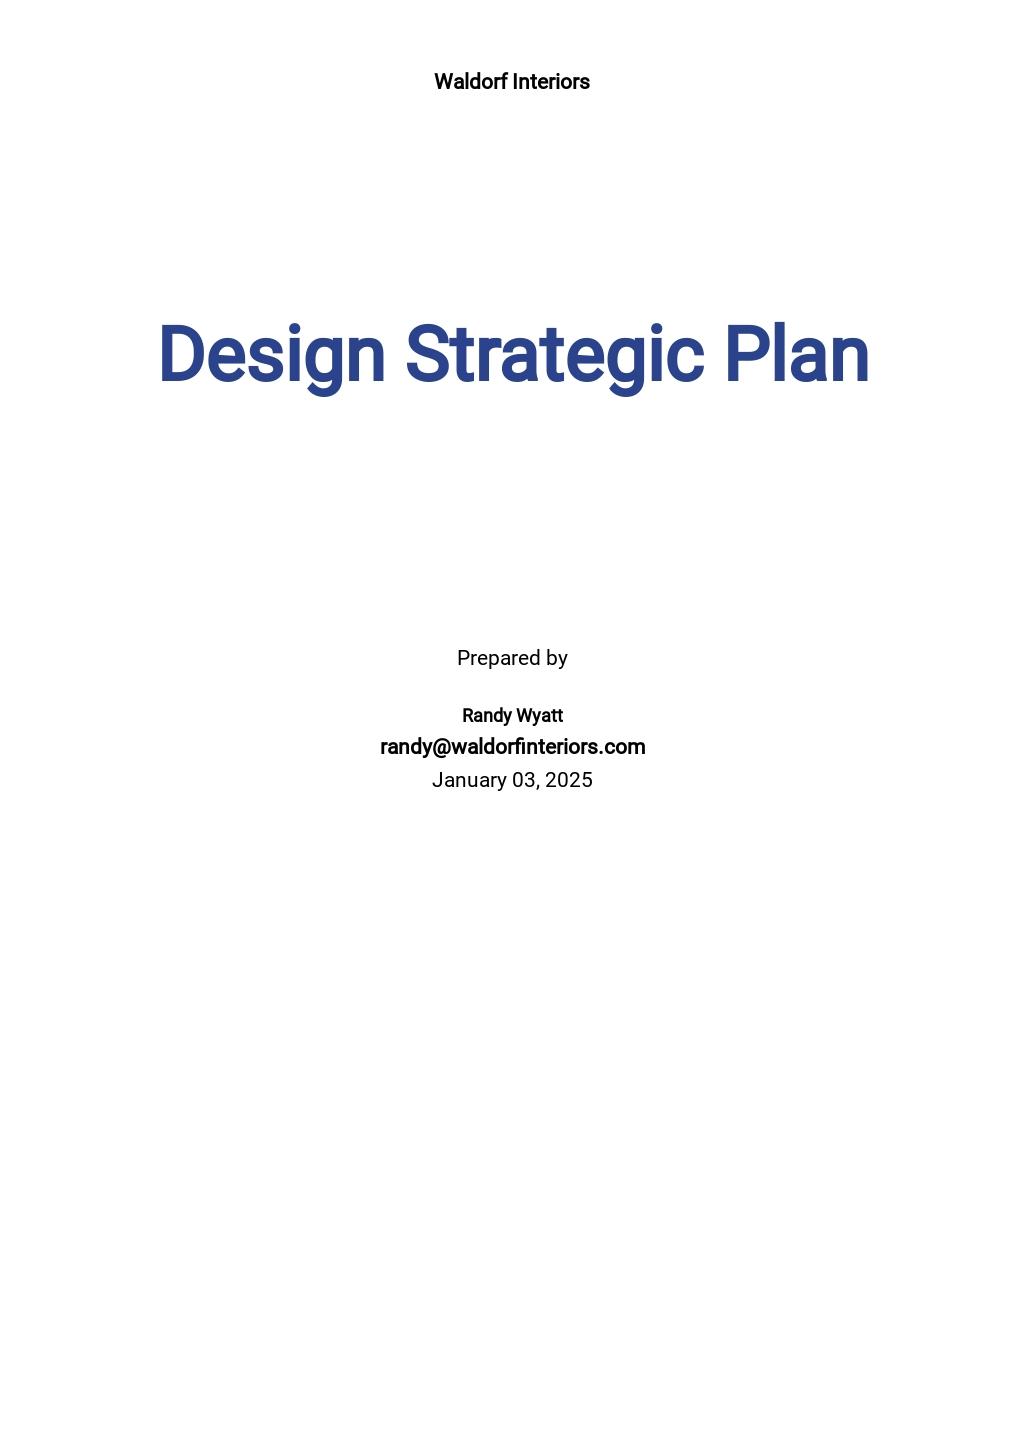 Design Strategic Plan Template.jpe